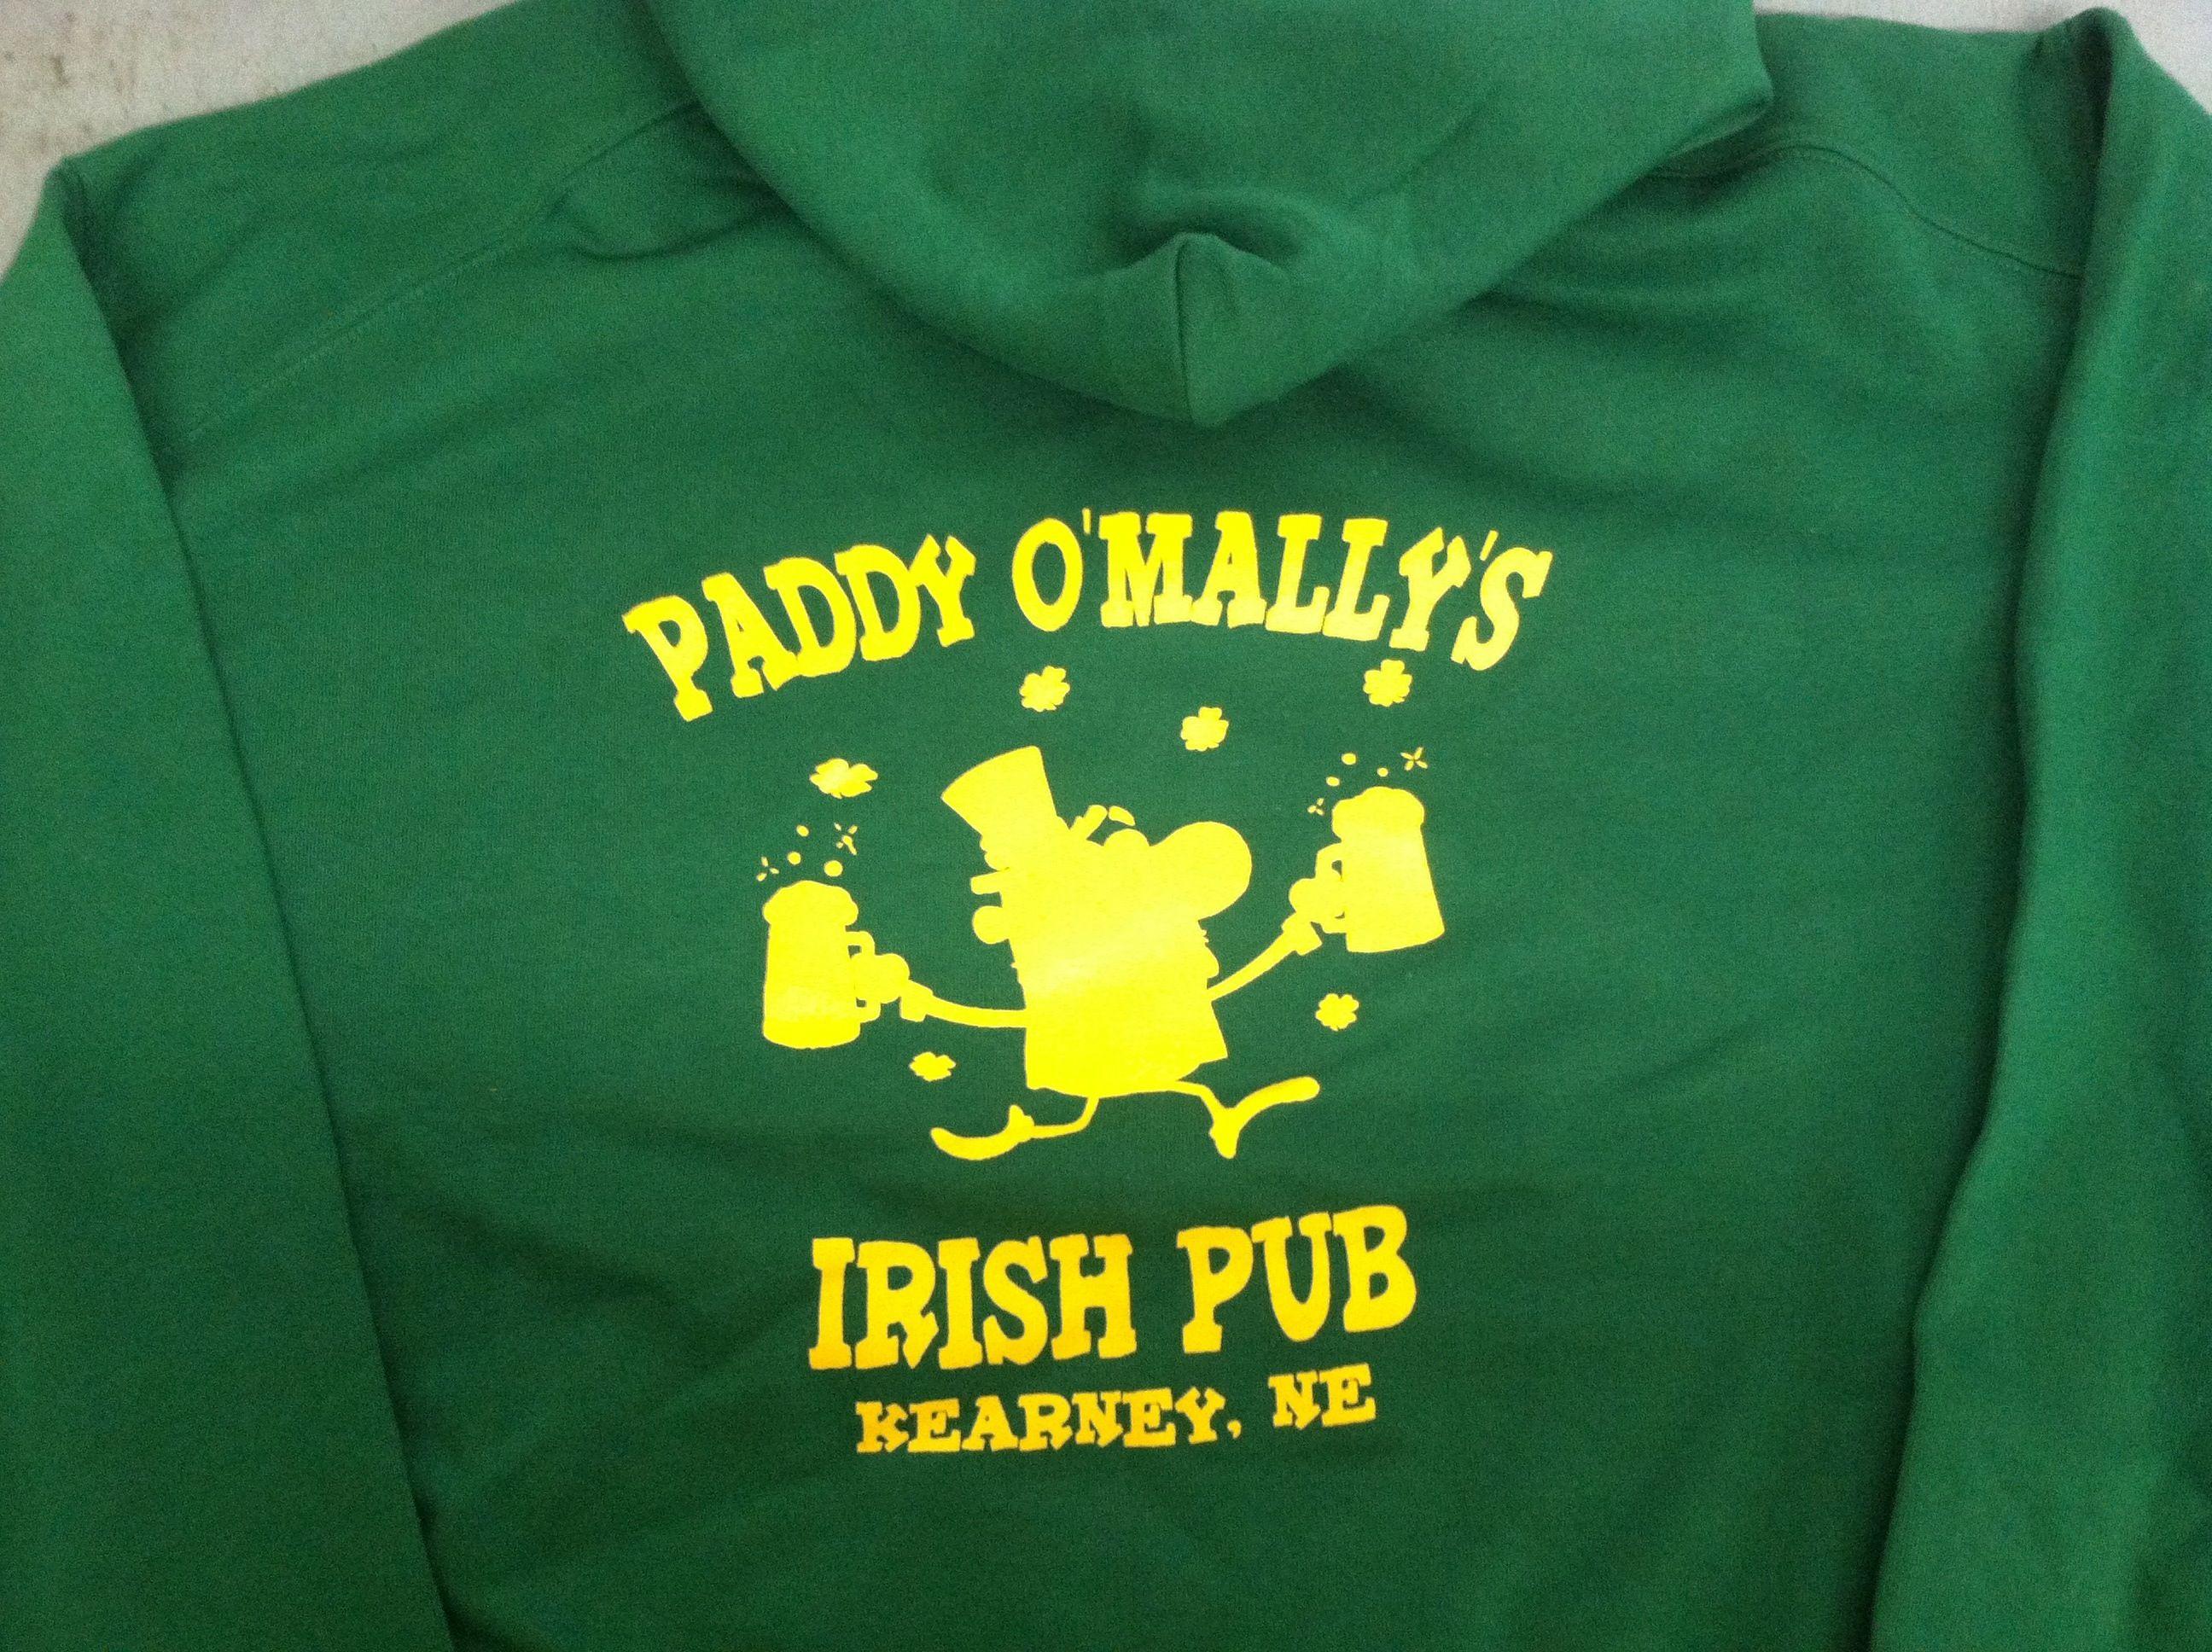 Shirt hoodie design - Paddy O Mallys Hoodie Design Kearney Nebraska Shirt Shack